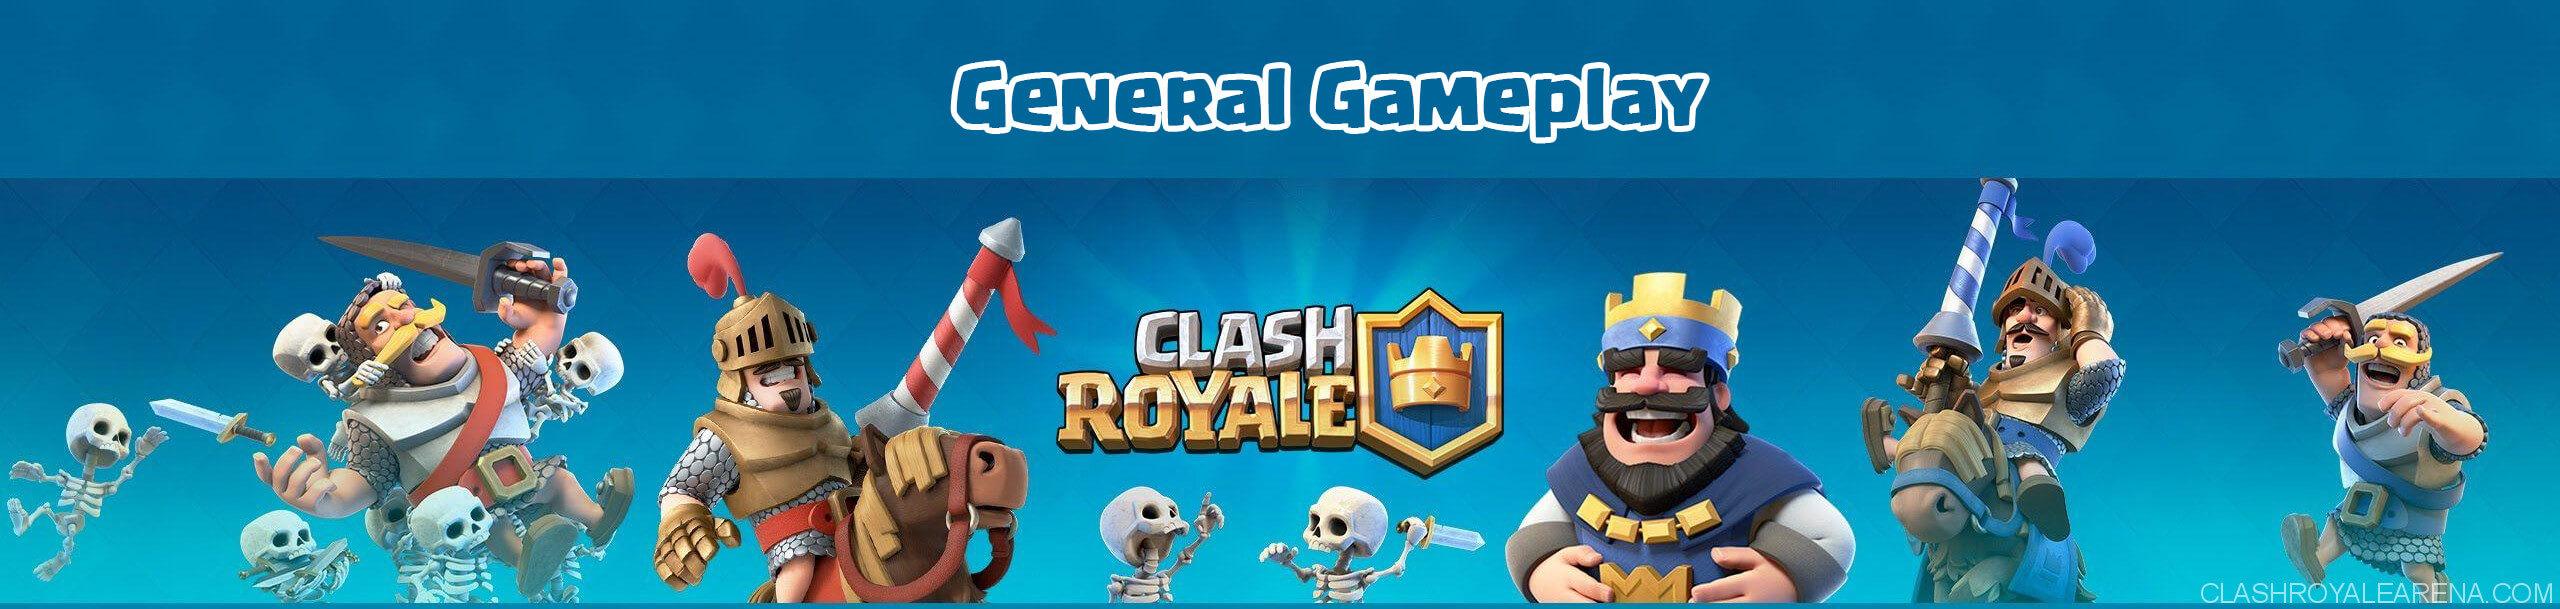 General Gameplay